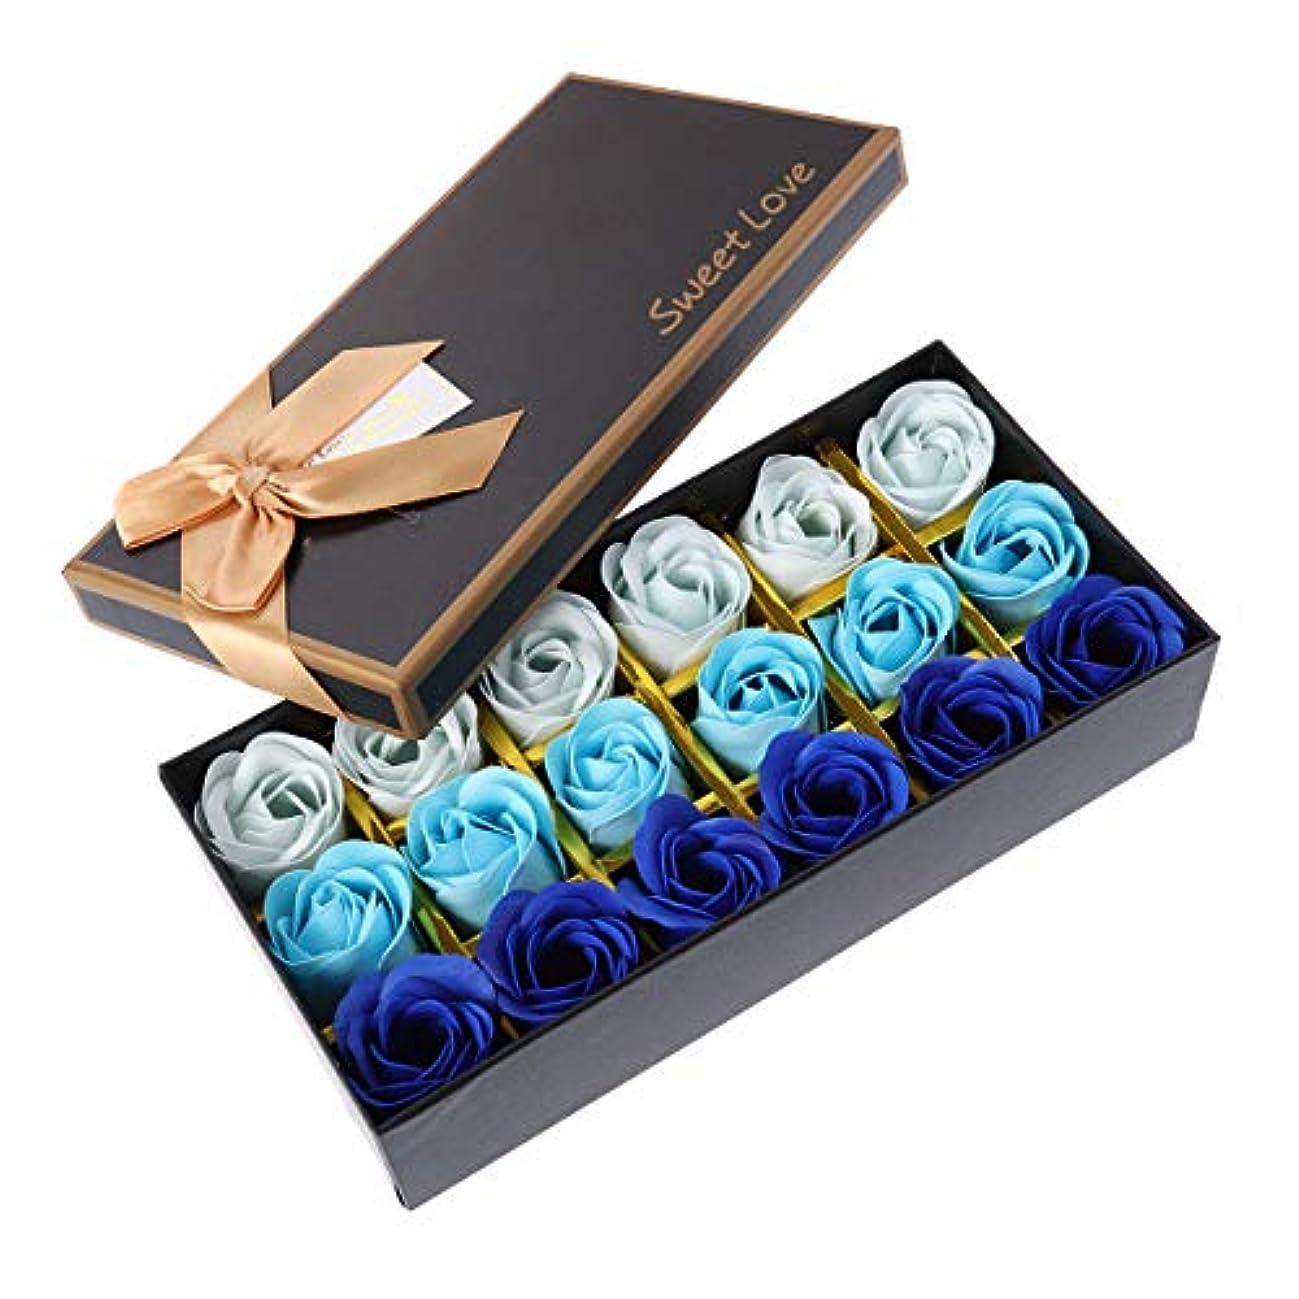 Beaupretty バレンタインデーの結婚式の誕生日プレゼントのための小さなクマとバラの石鹸の花